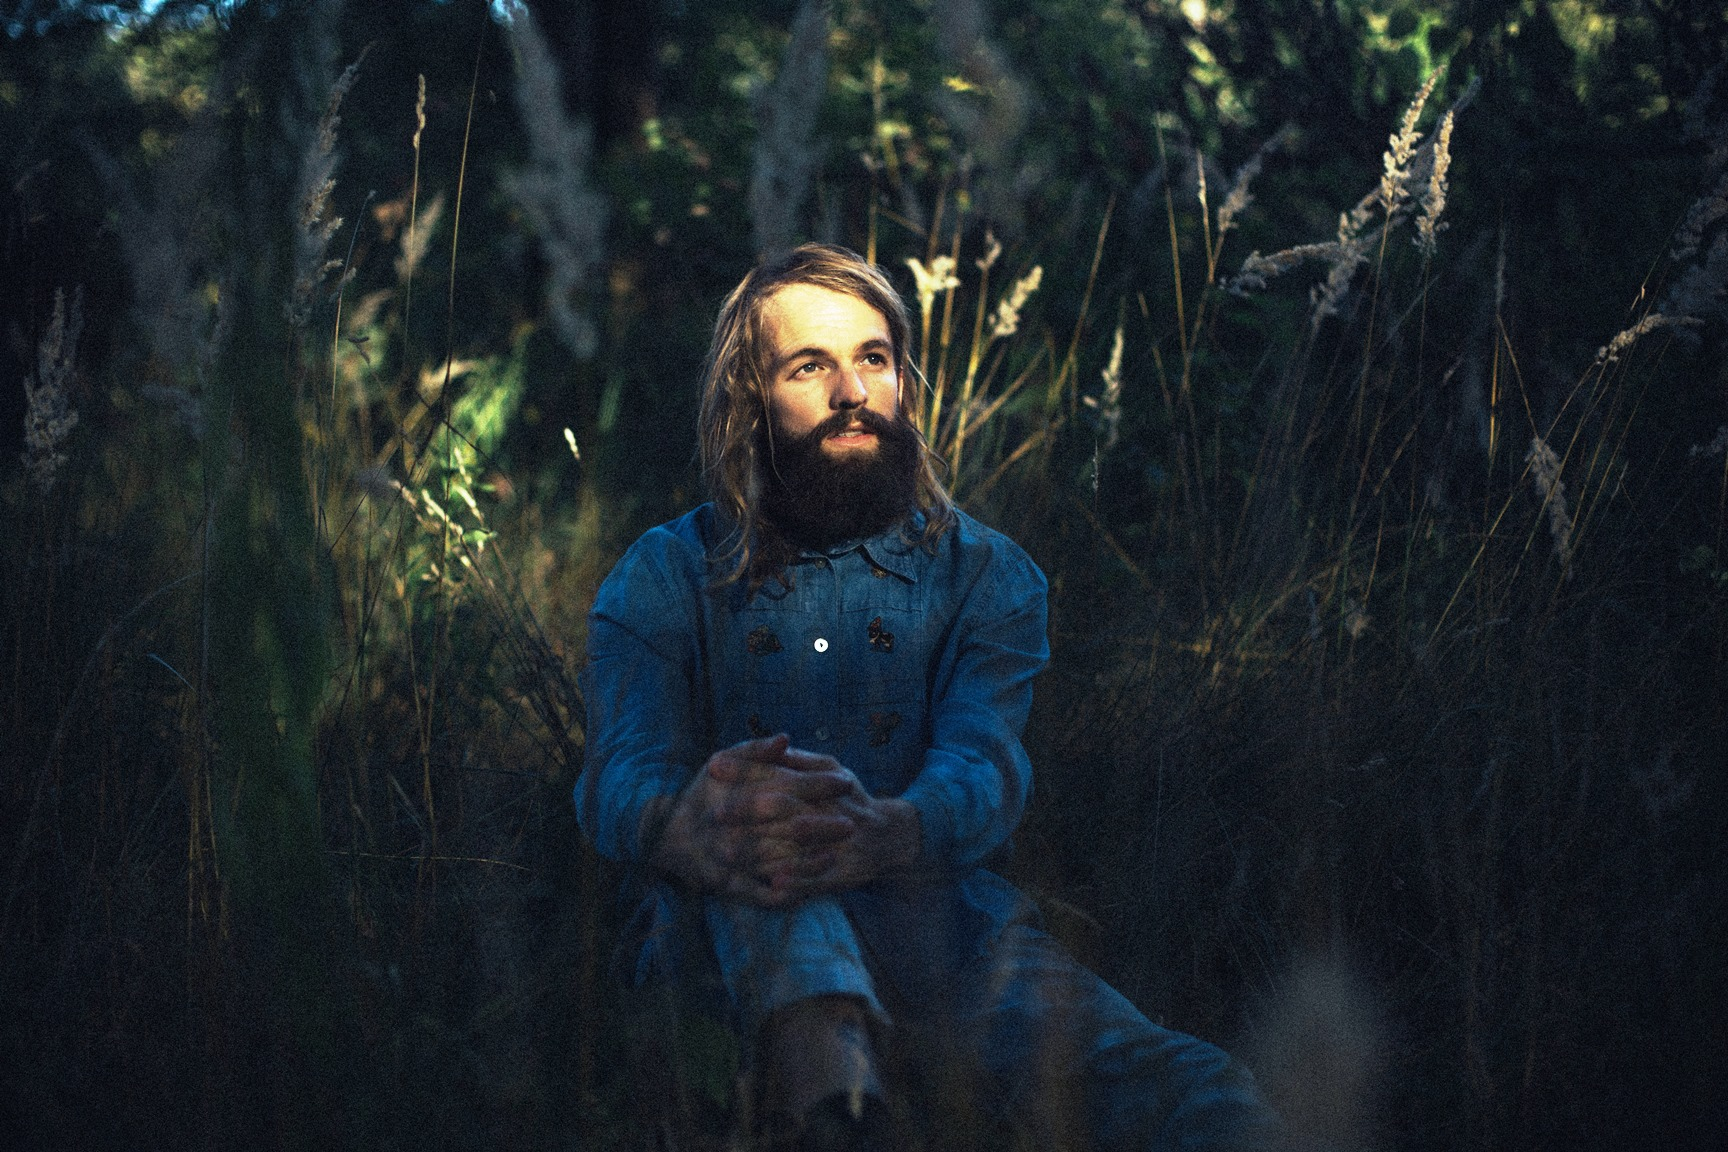 Lucas Laufen (Australia) - Photo - Lucas_Laufen_2_by_Jordan_Kirk